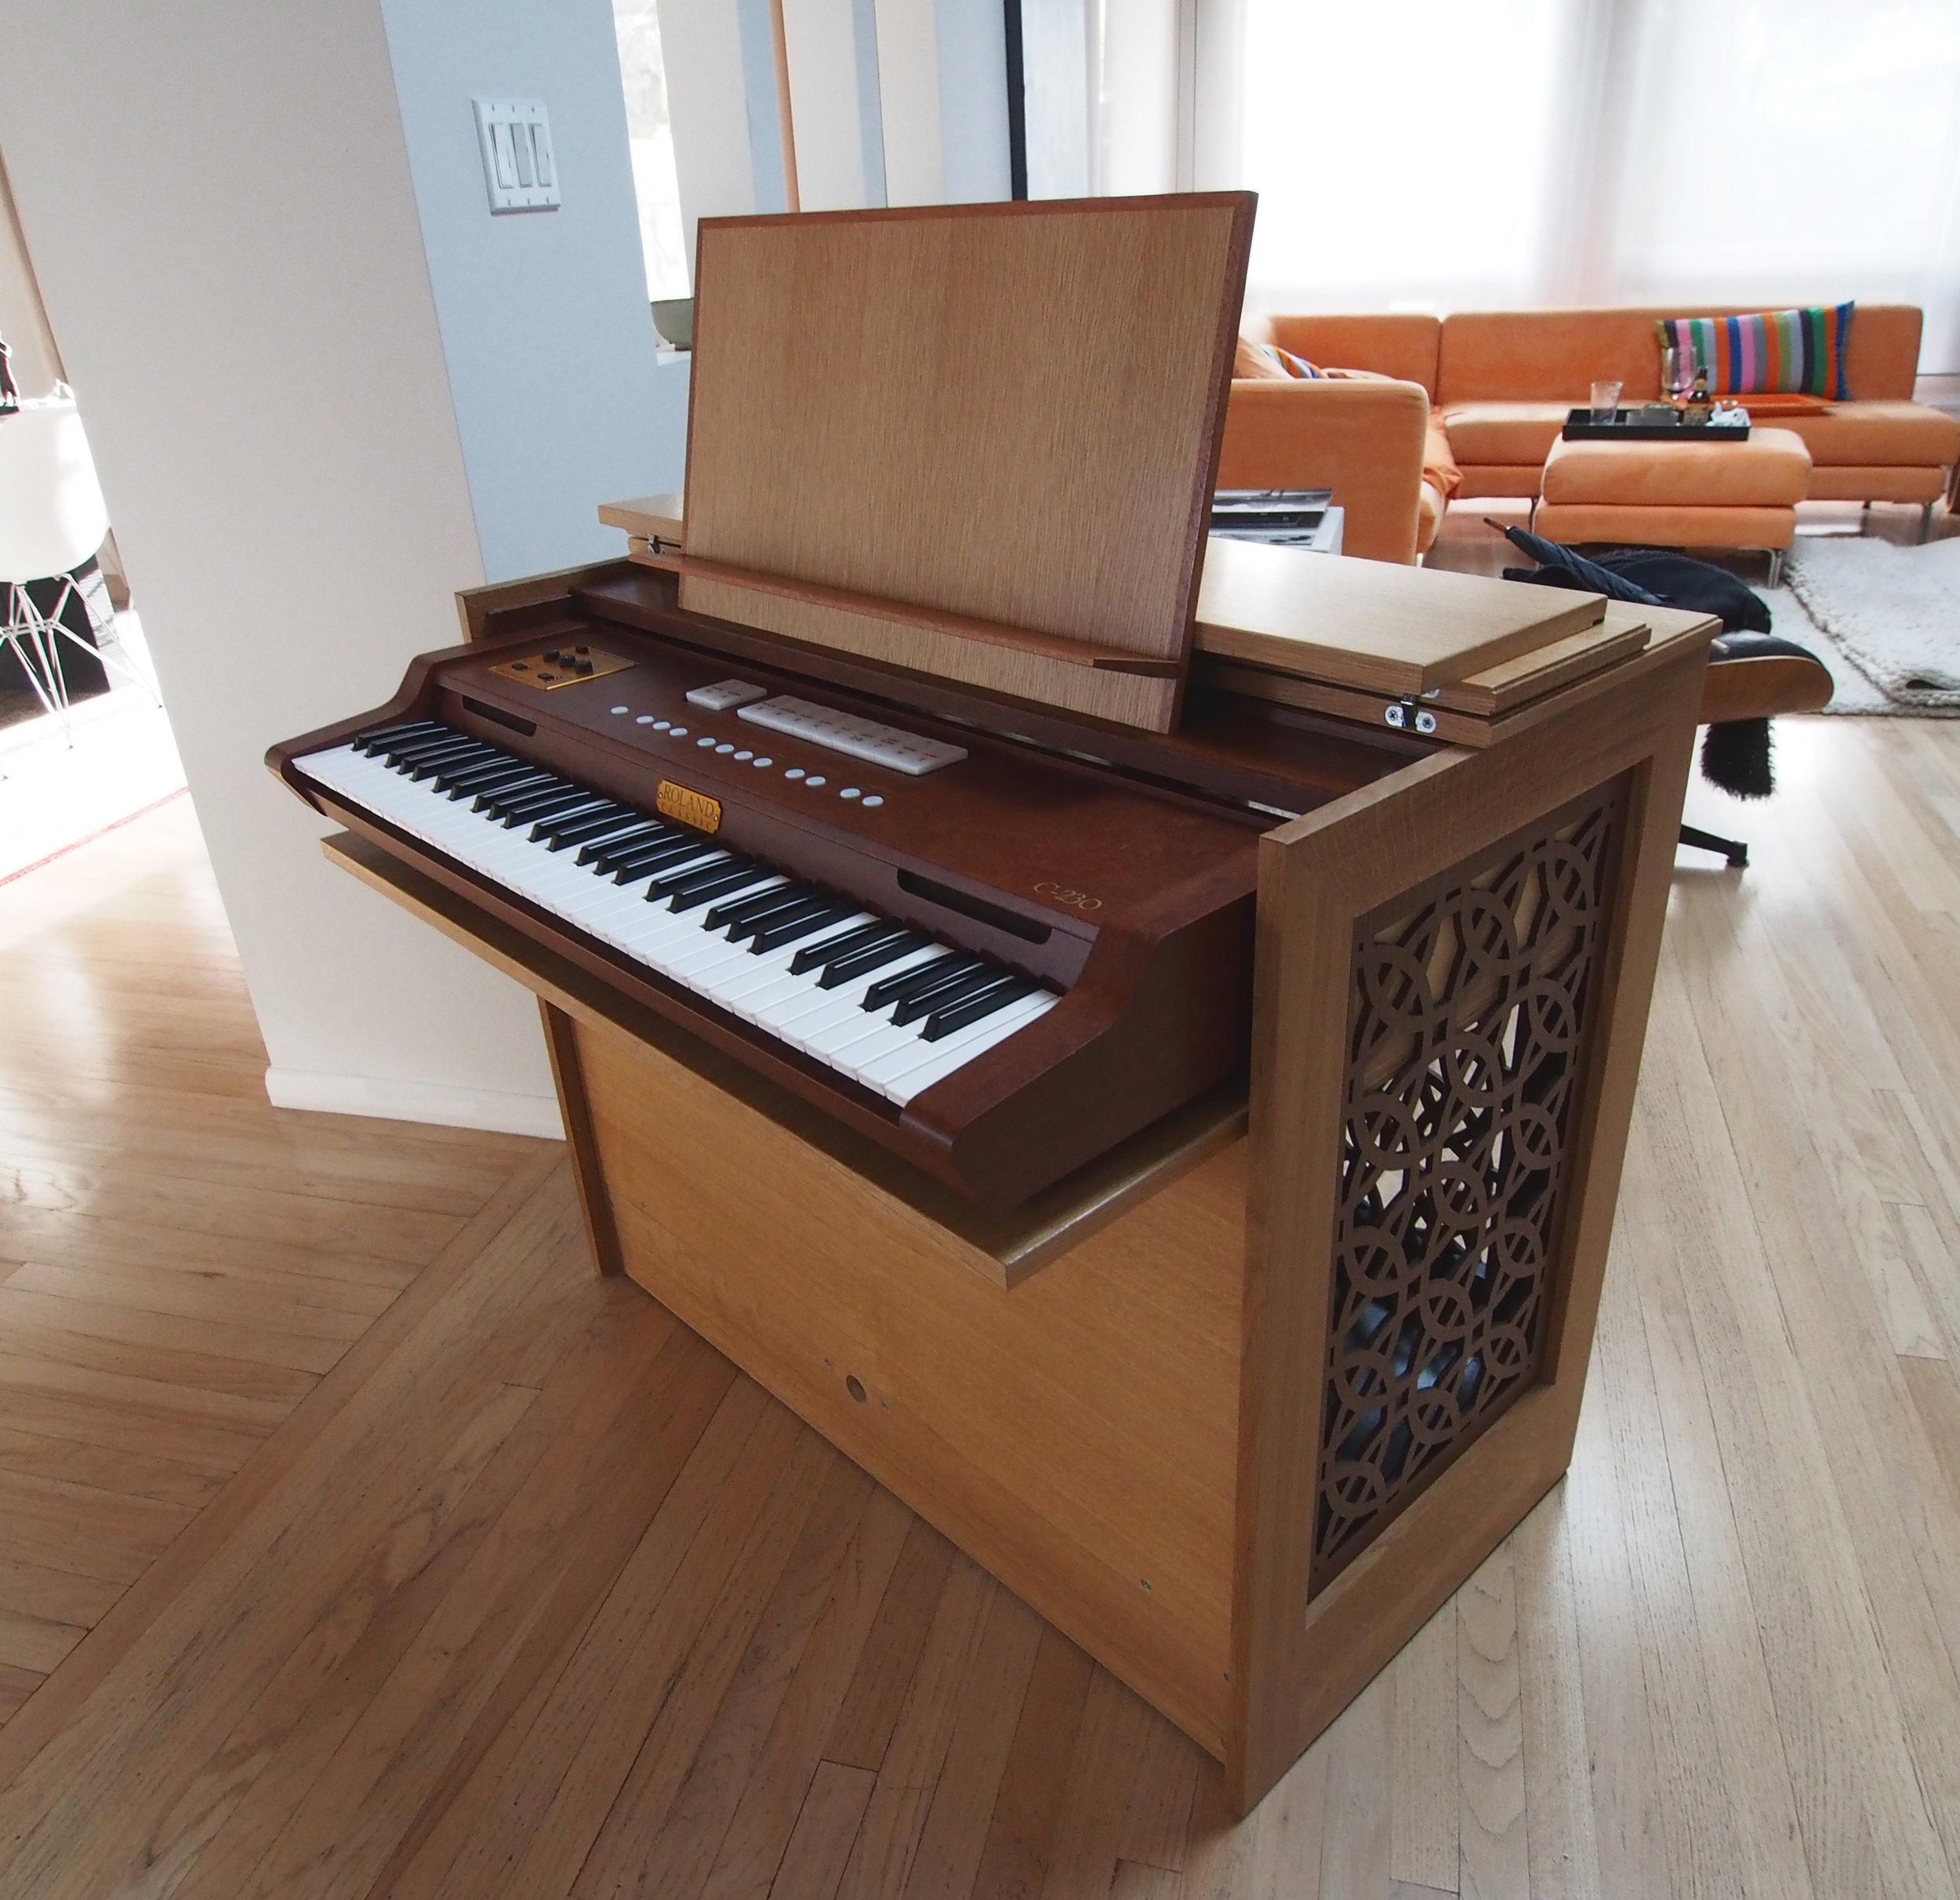 Custom cabinetry/furniture